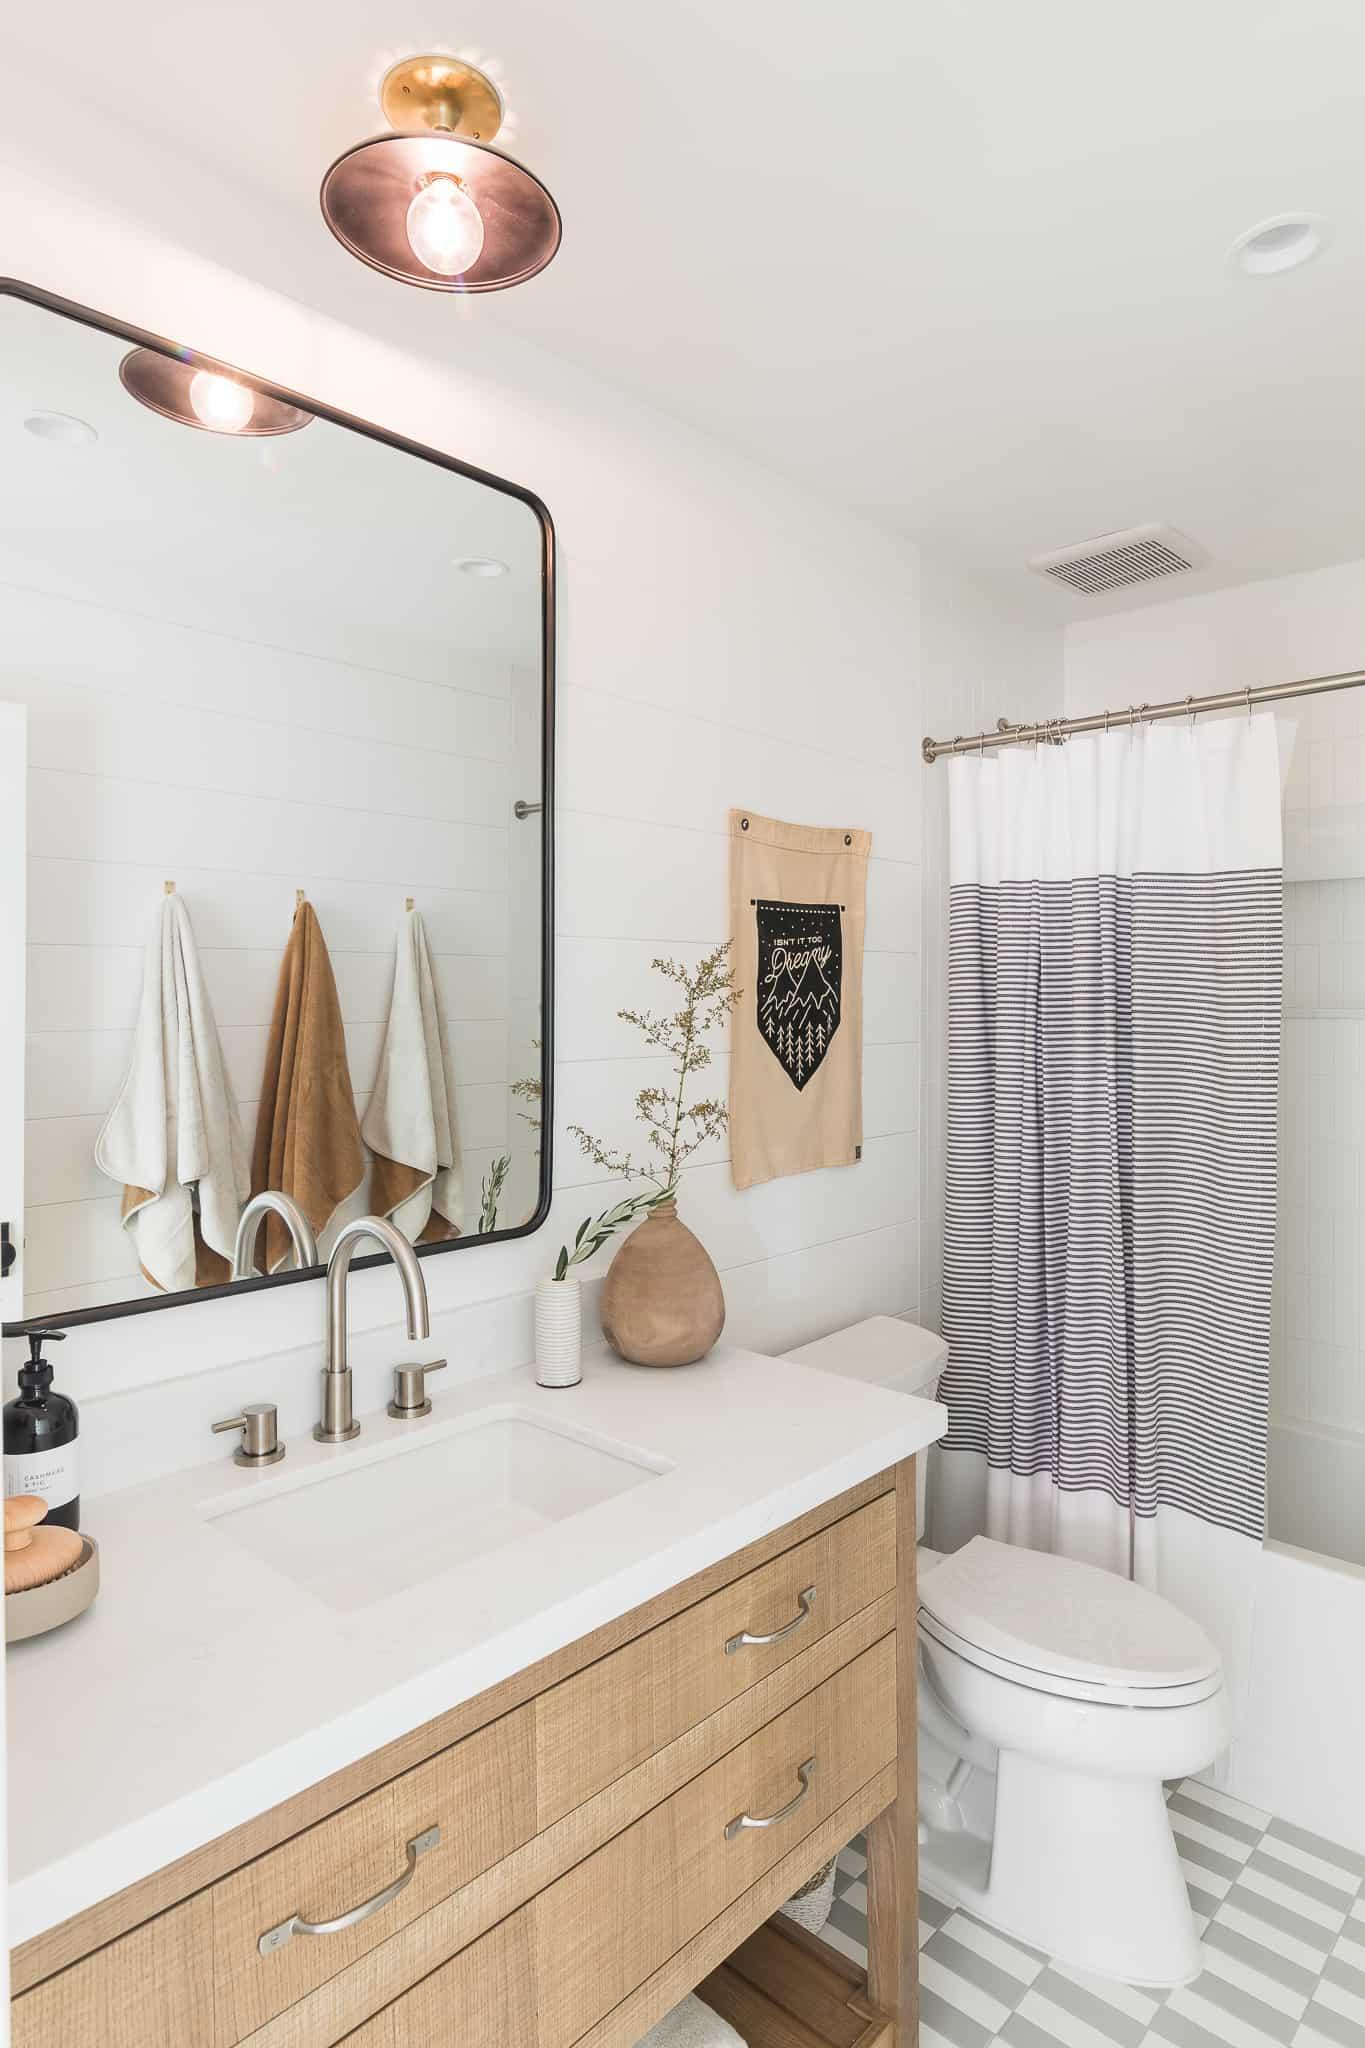 Lake Arrowhead Bathroom Remodel: Splurge vs. Save - Mindy Gayer Design Co.